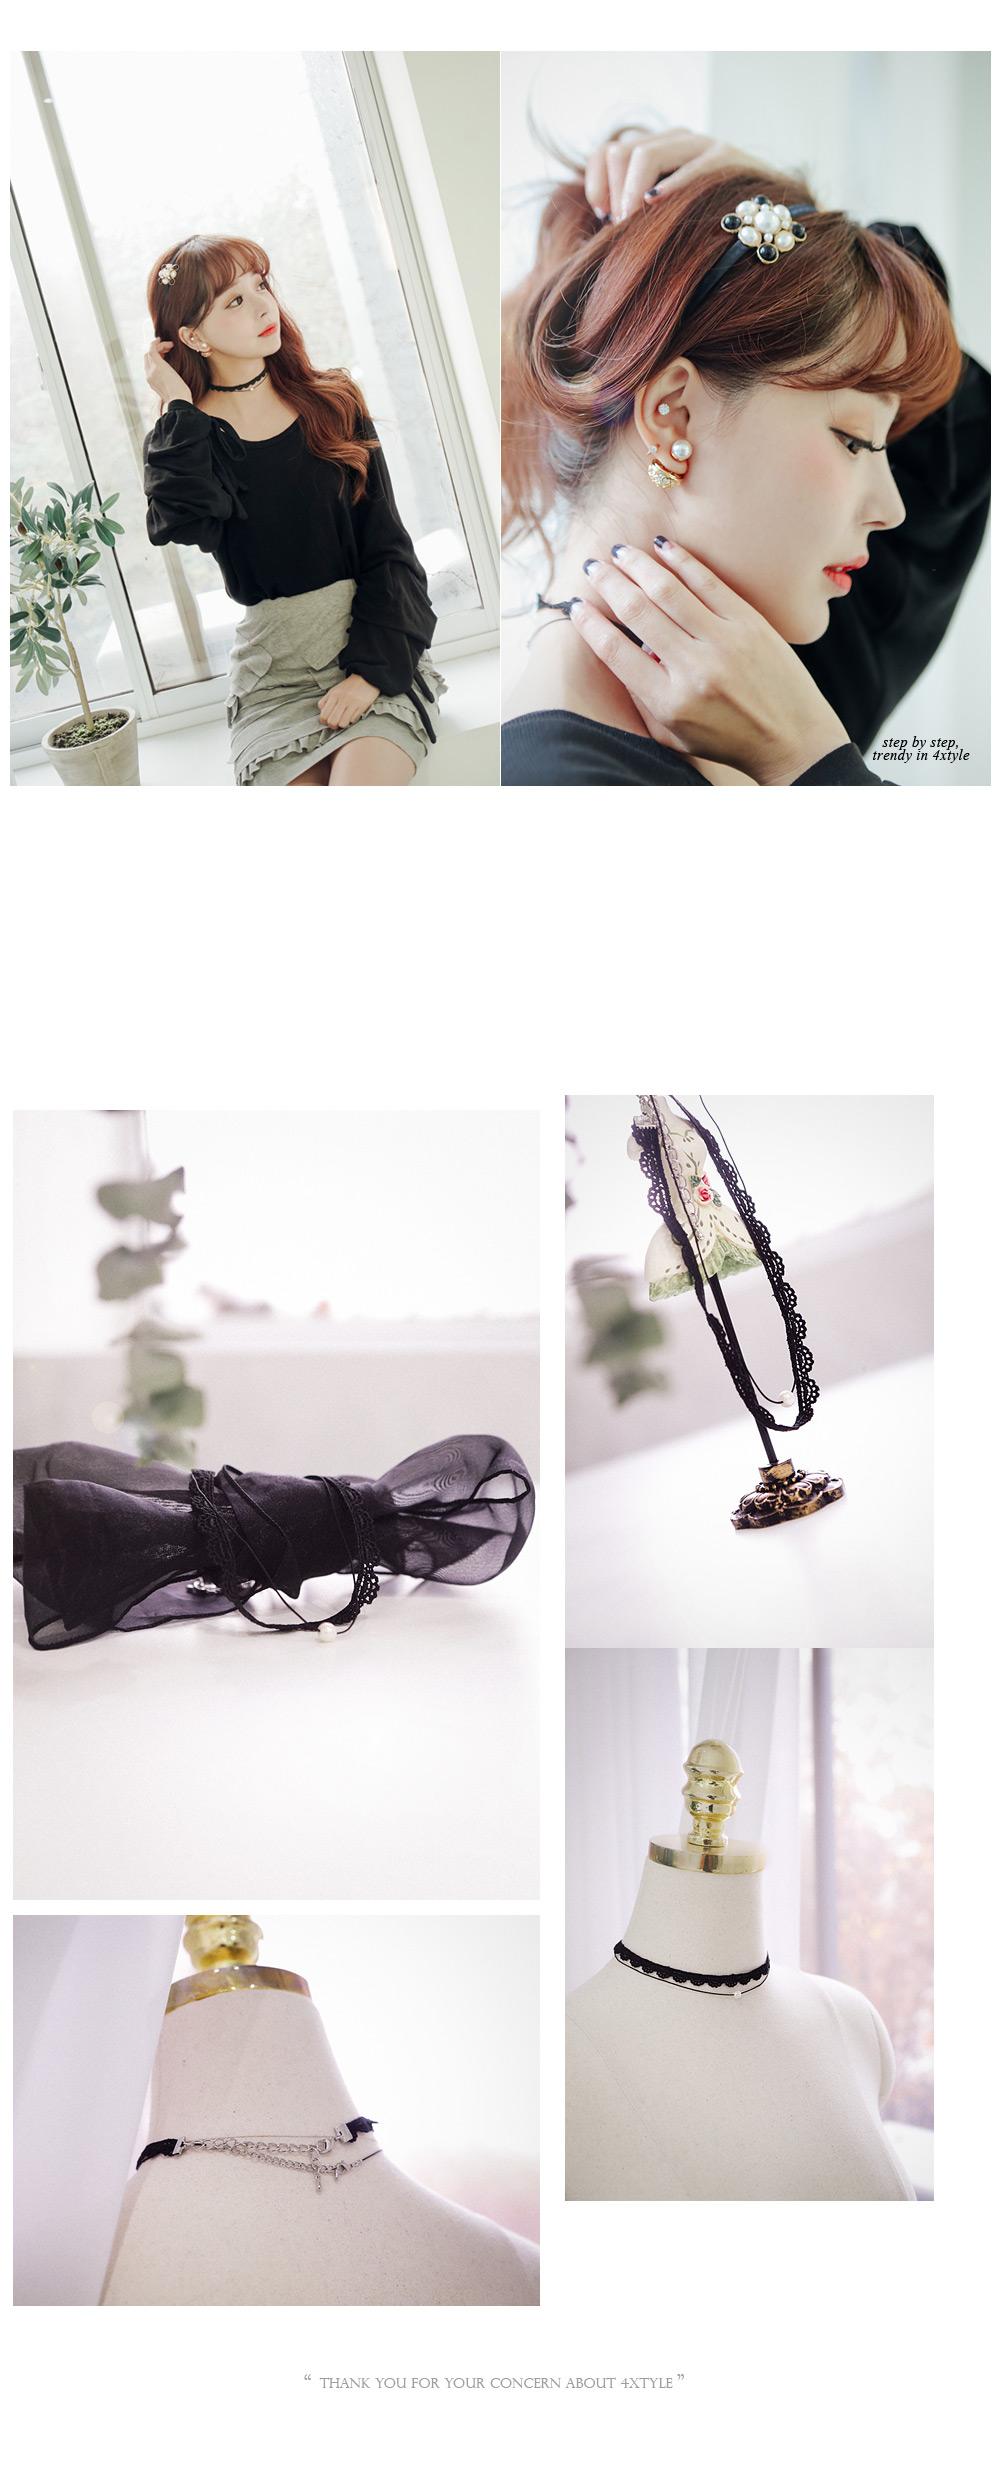 [ 4xtyle ] 黑天鹅环项链、一种颜色